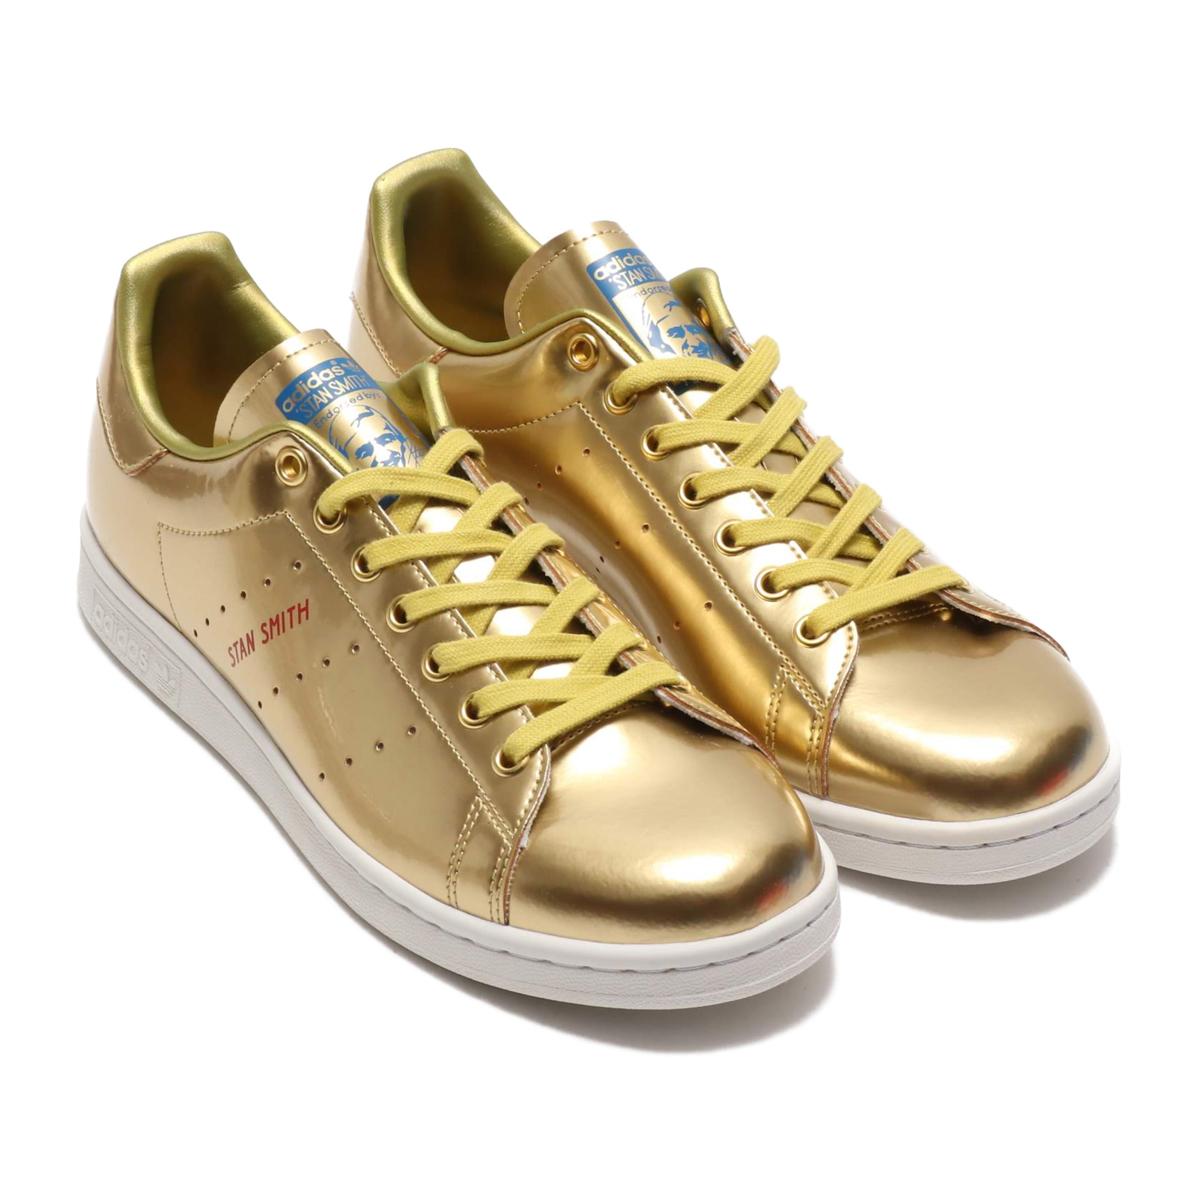 adidas STAN SMITH(アディダス スタンスミス)GOLD METRIC/GOLD METRIC/CRYSTAL WHITE【メンズ レディース スニーカー】20SS-I